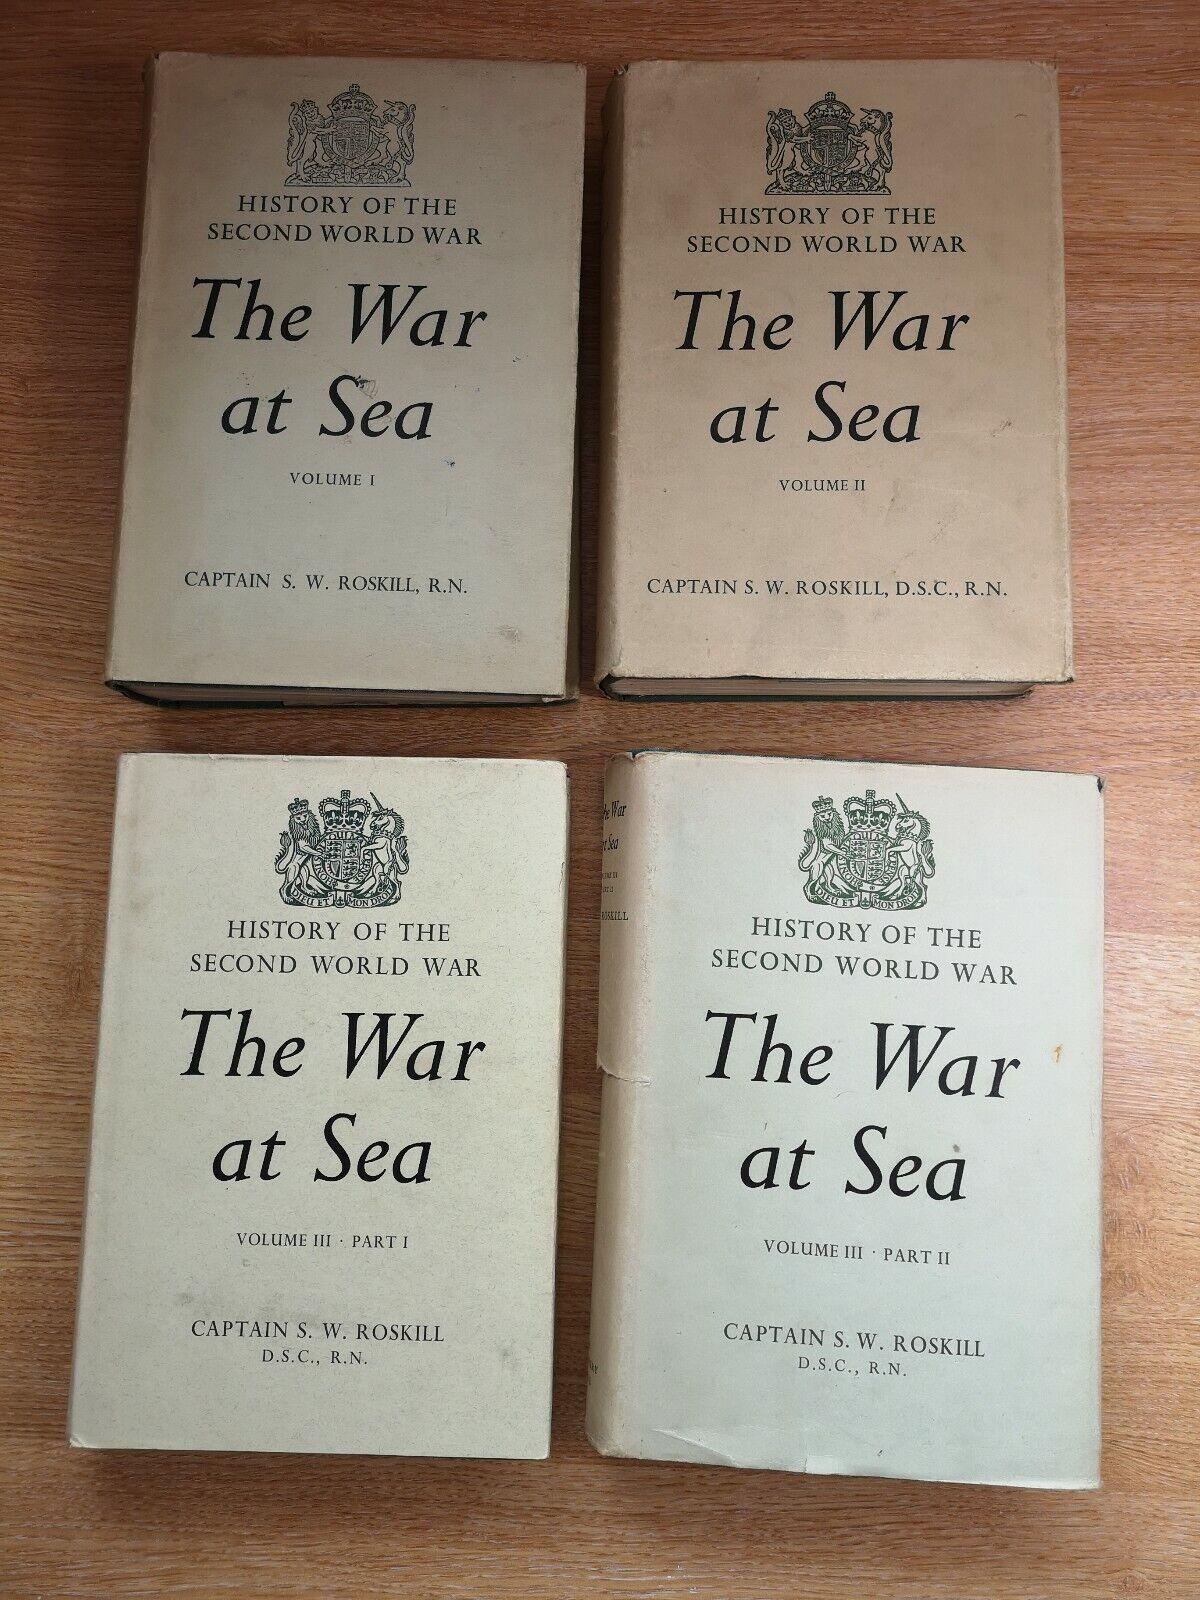 4 Vol. historia de la segunda guerra mundial la guerra en el mar capitán S W Roskill 1939-1945